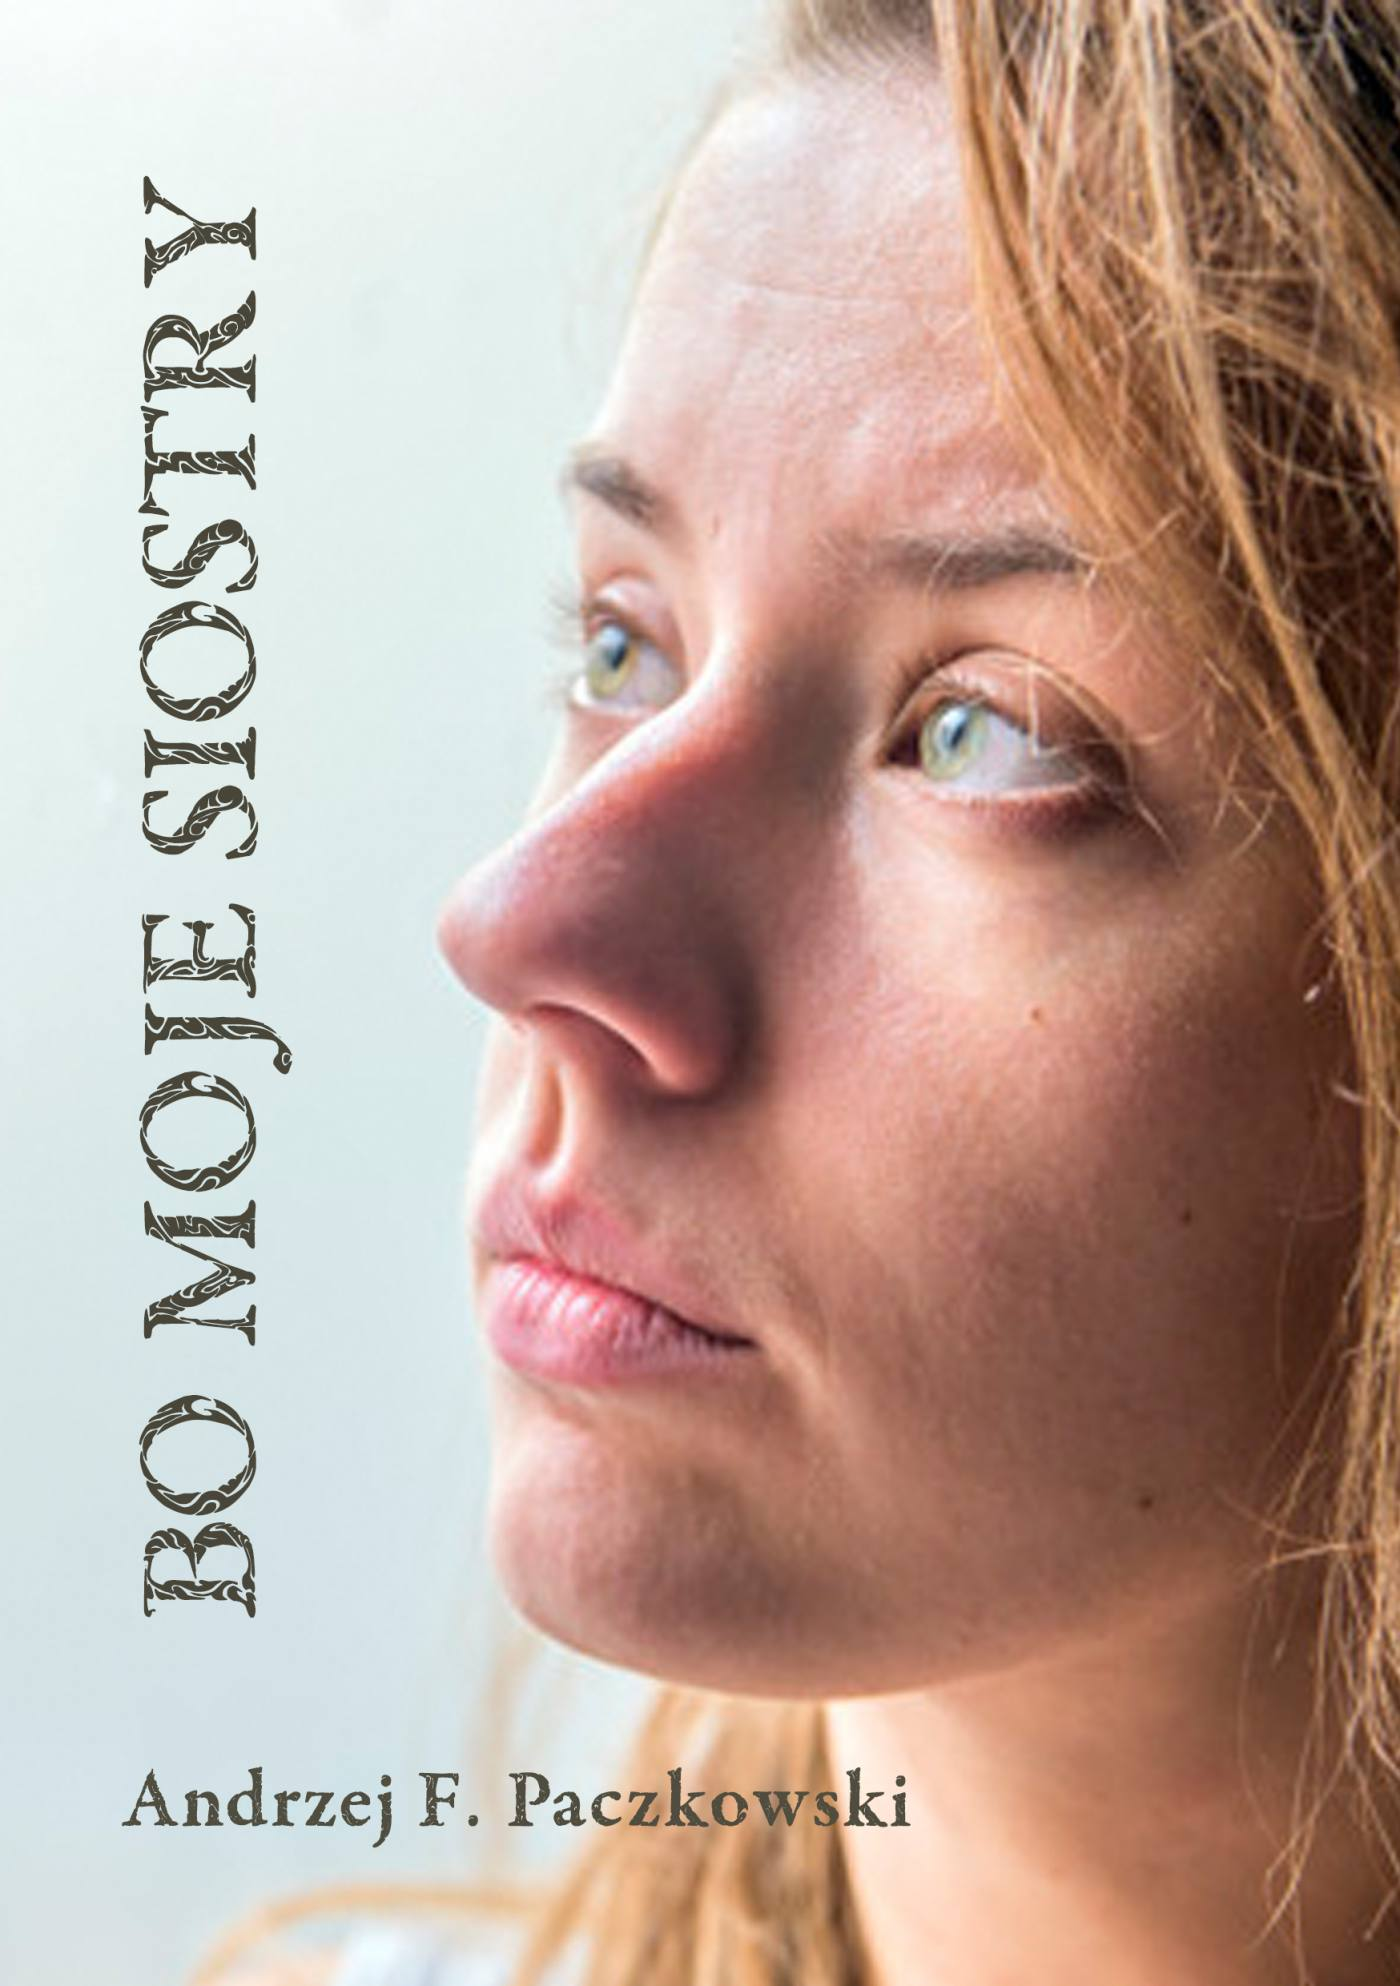 Bo moje siostry - Ebook (Książka PDF) do pobrania w formacie PDF